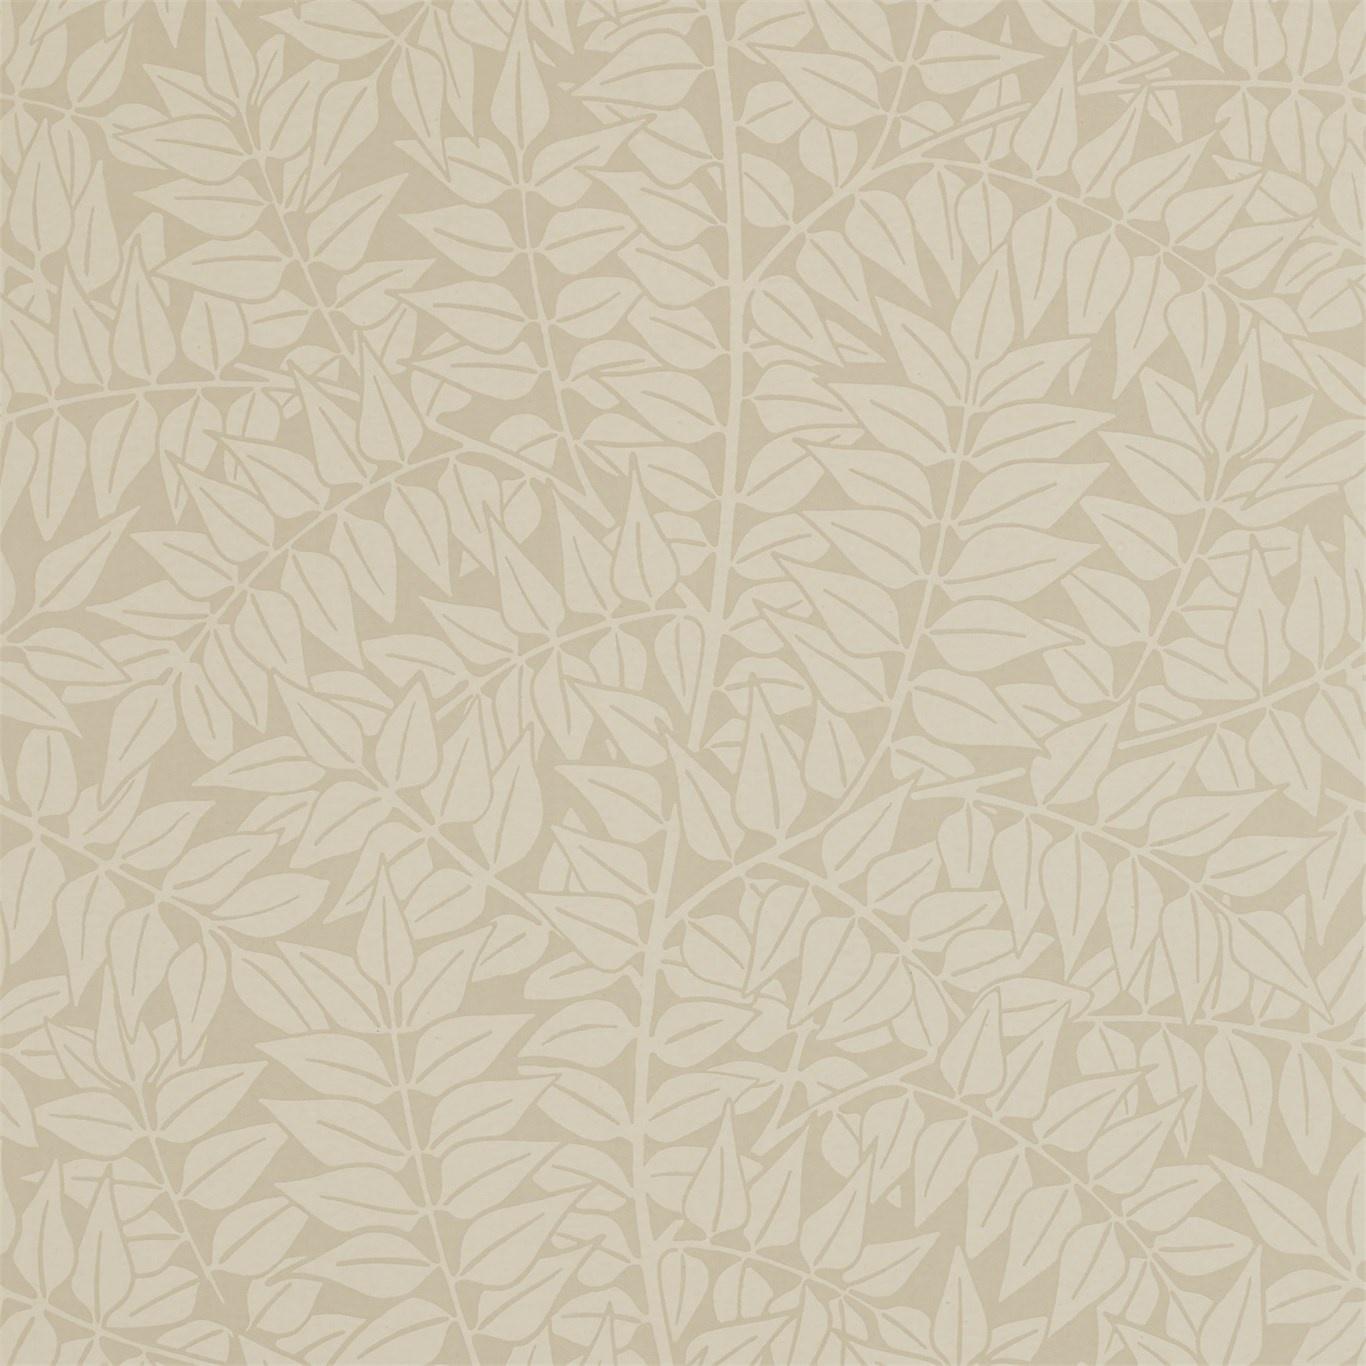 Image of Morris & Co Branch Buff Wallpaper 210377